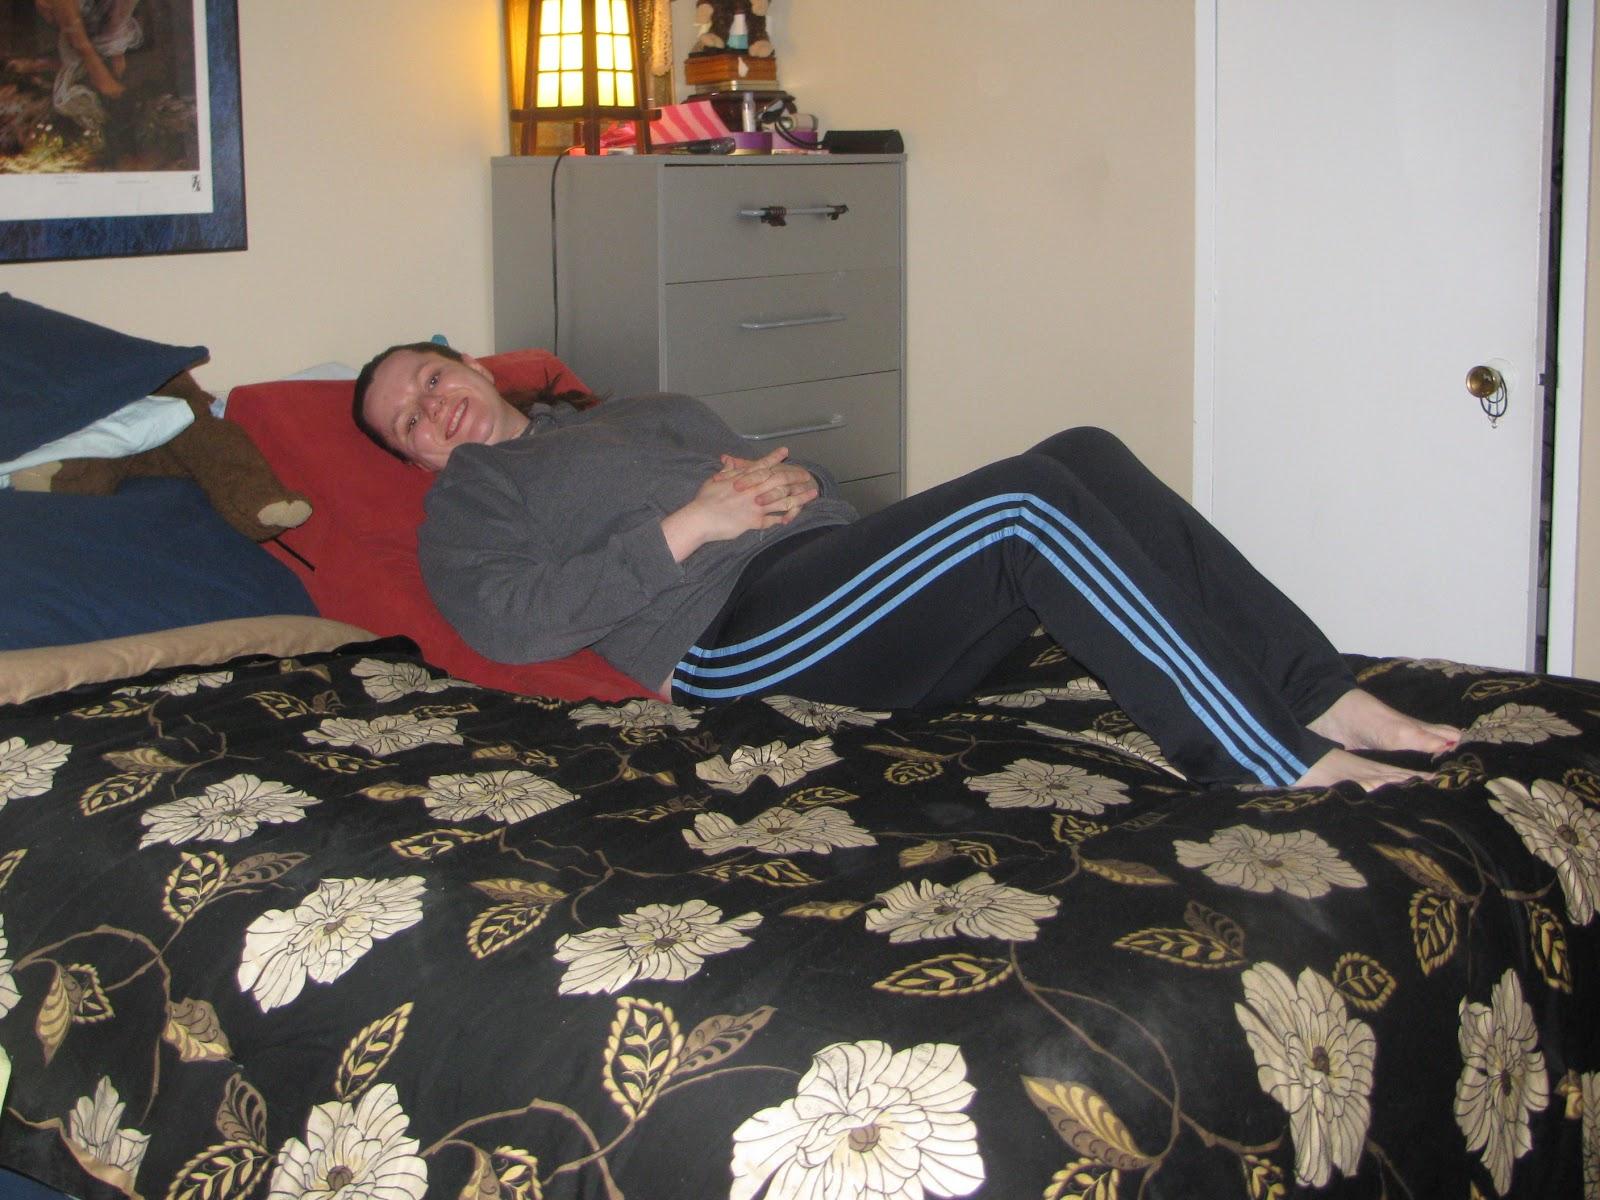 Liberator Bedroom Furniture No Ordinary Sex Toy Fatgirl Vs World